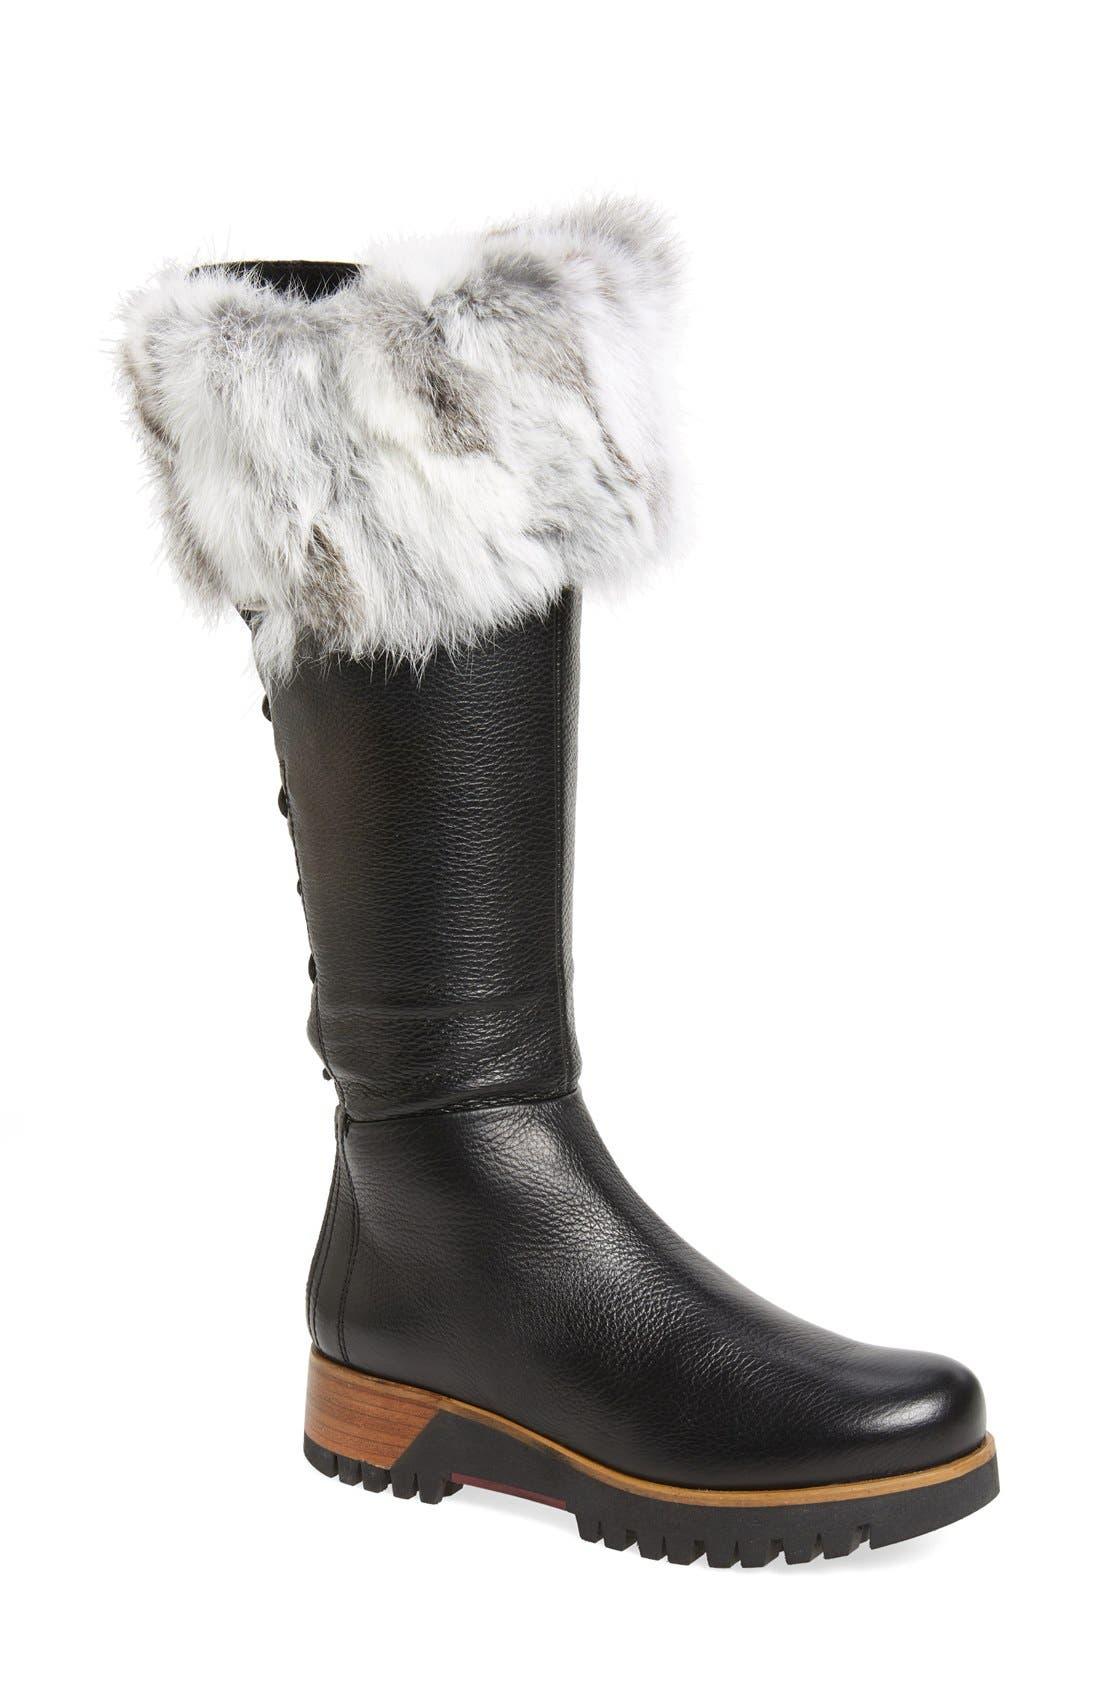 Alternate Image 1 Selected - Rudsack Baddow Genuine Rabbit Fur Trim Winter Boot (Women)